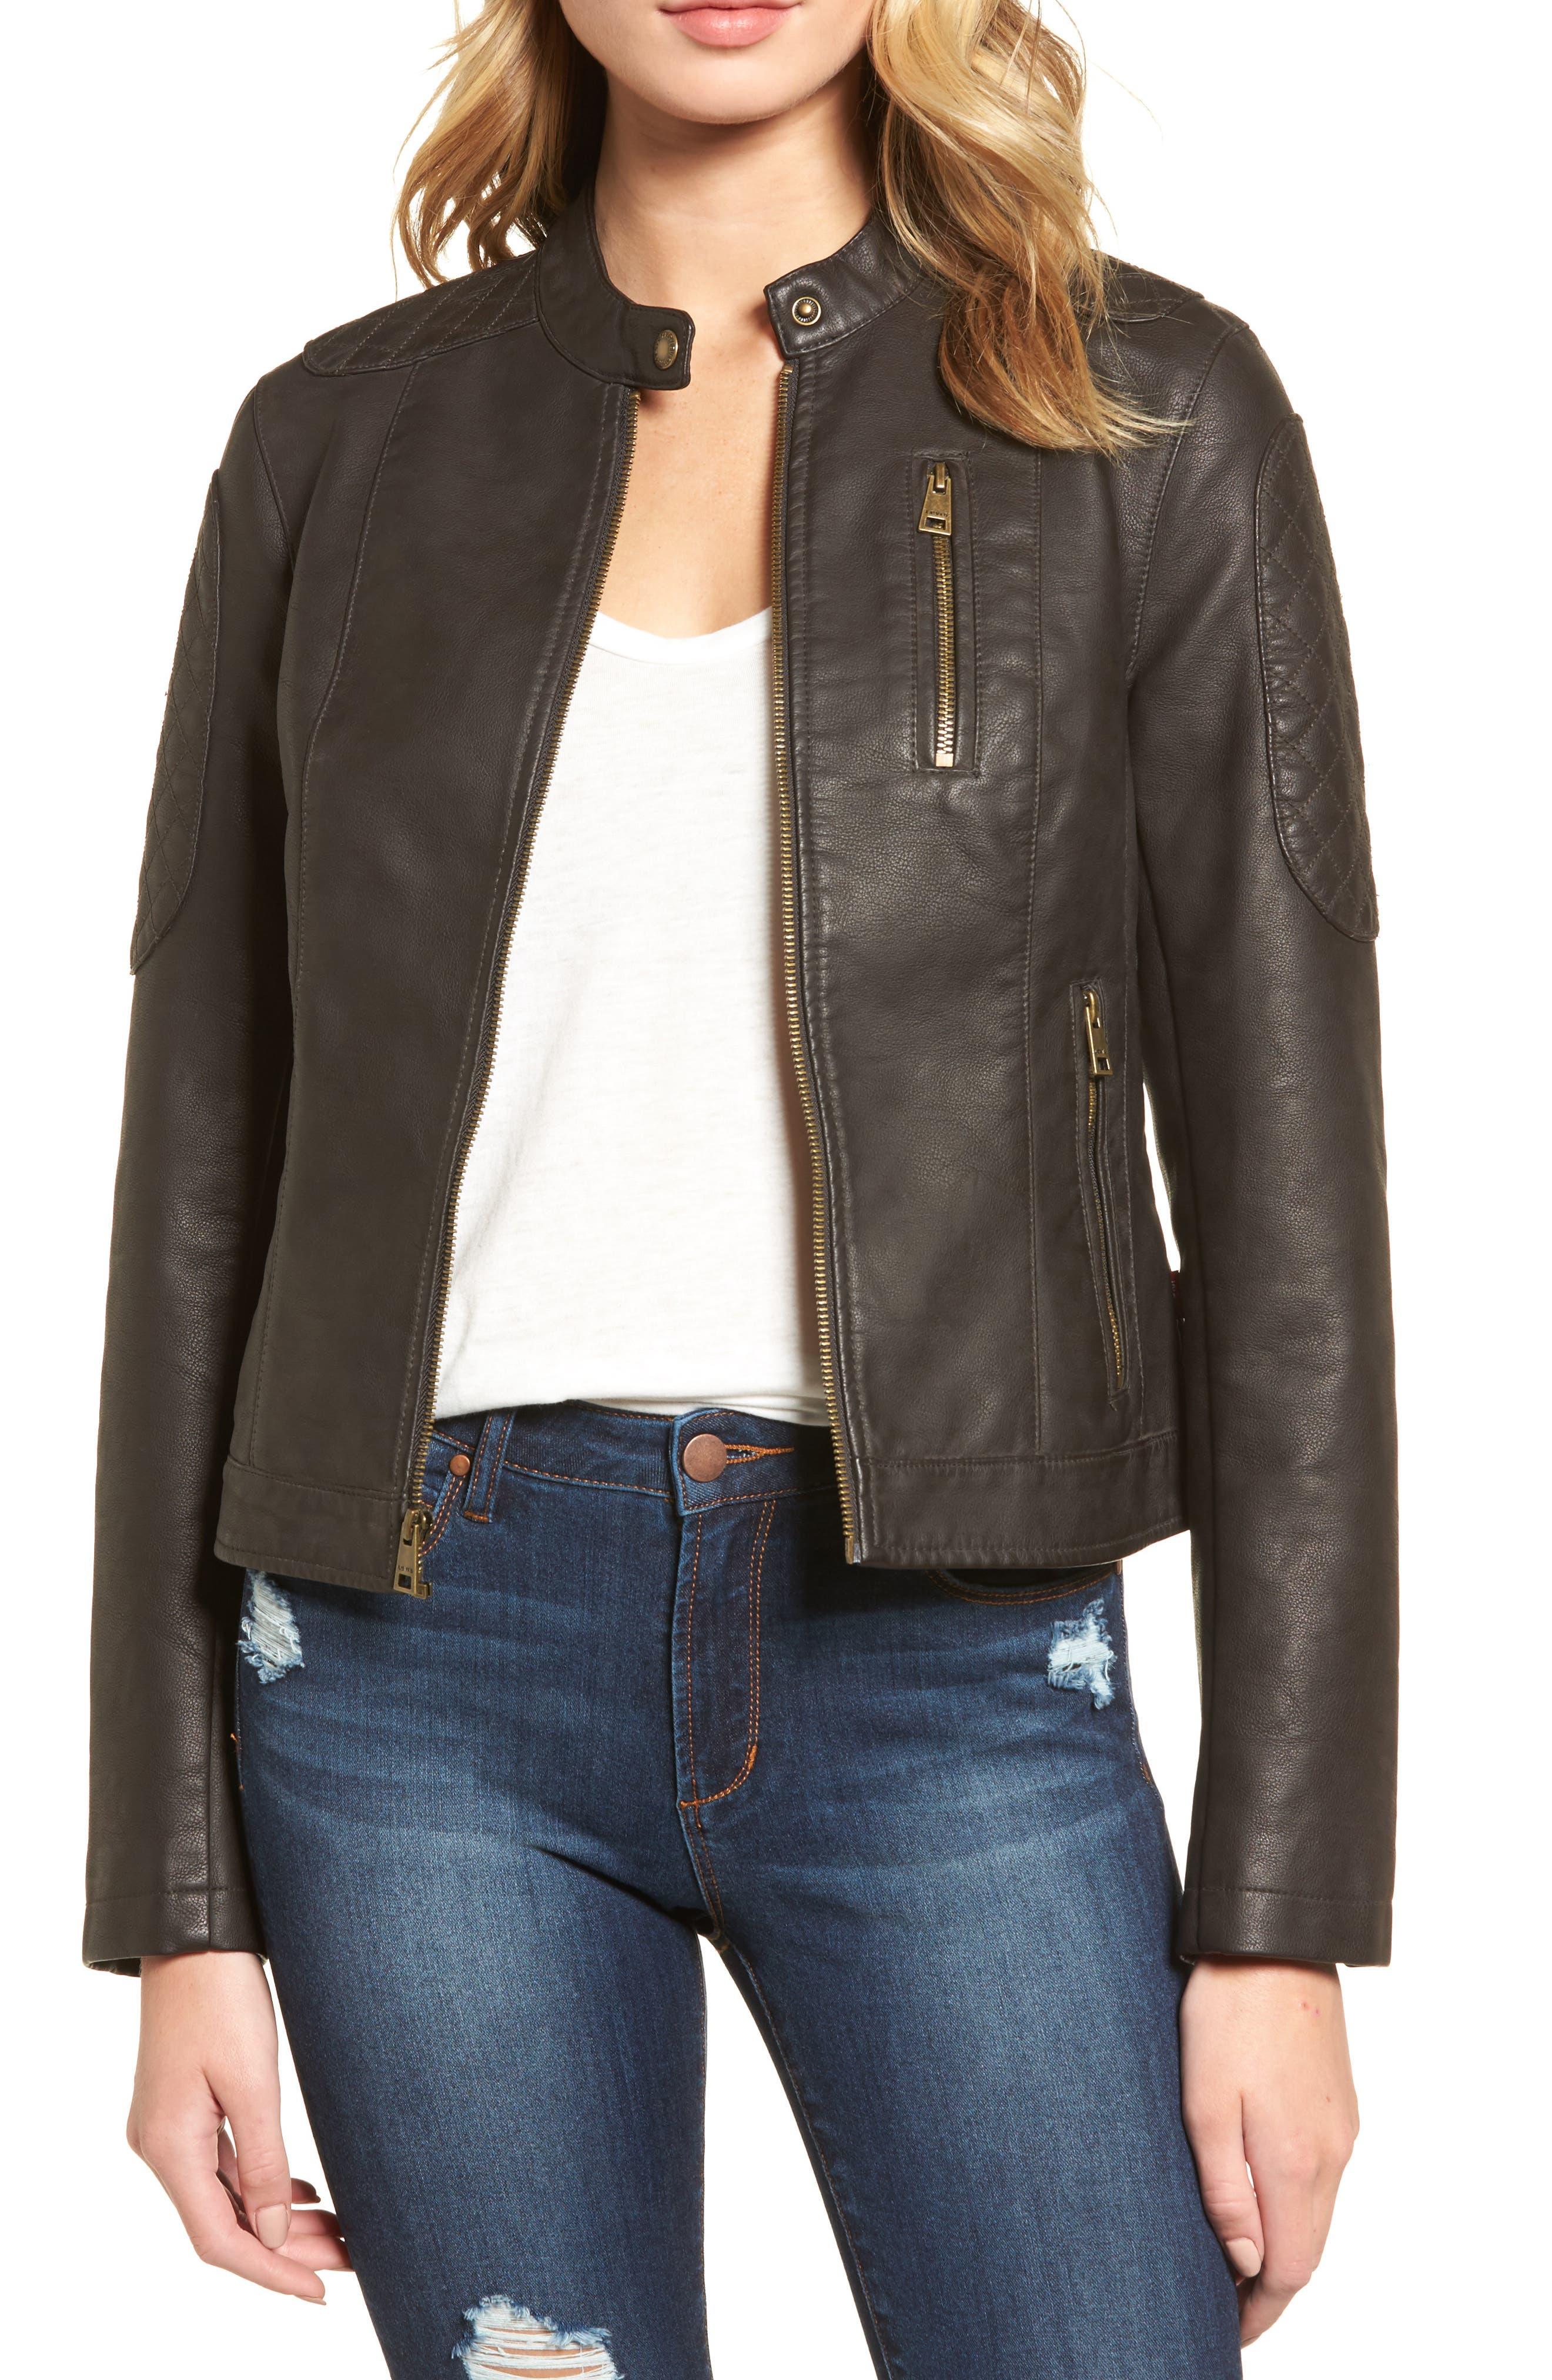 LEVIS<sup>®</sup> Faux Leather Moto Jacket,                         Main,                         color, Brown